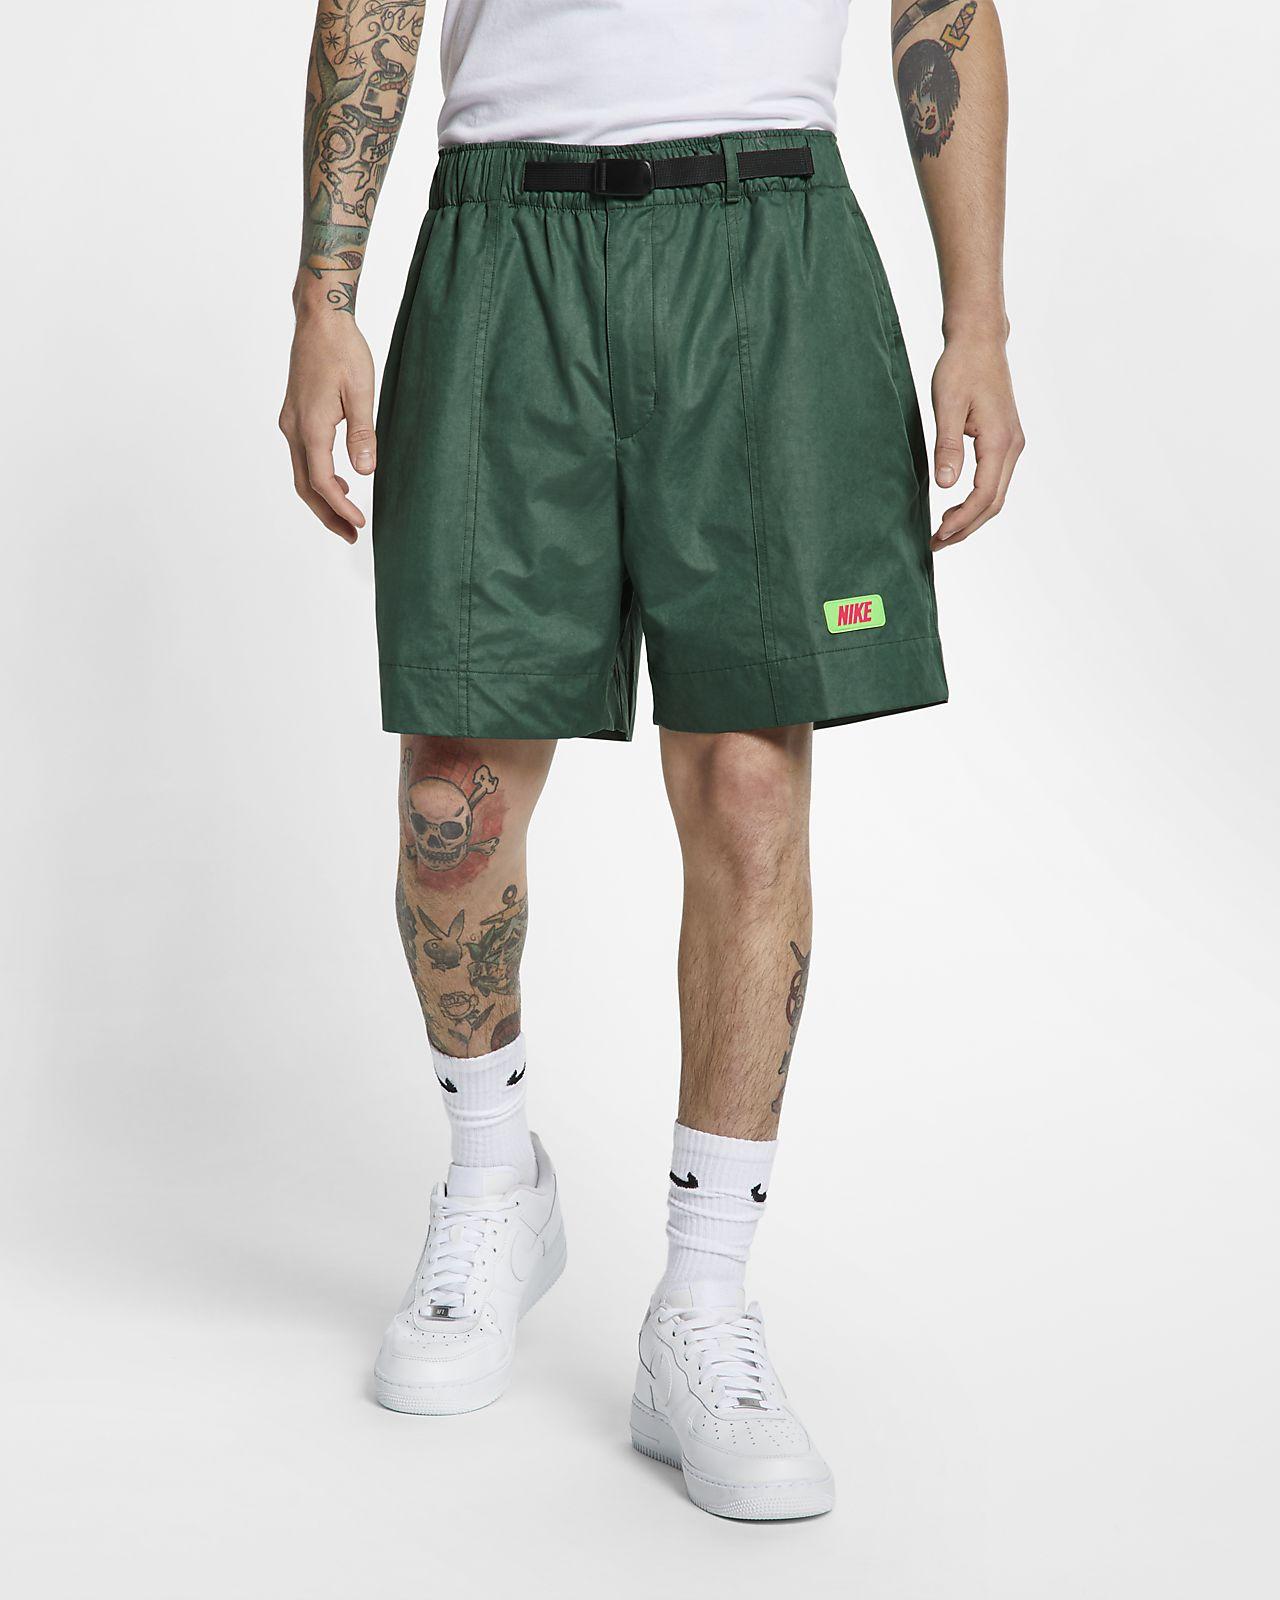 Nike Quest Cargo Shorts